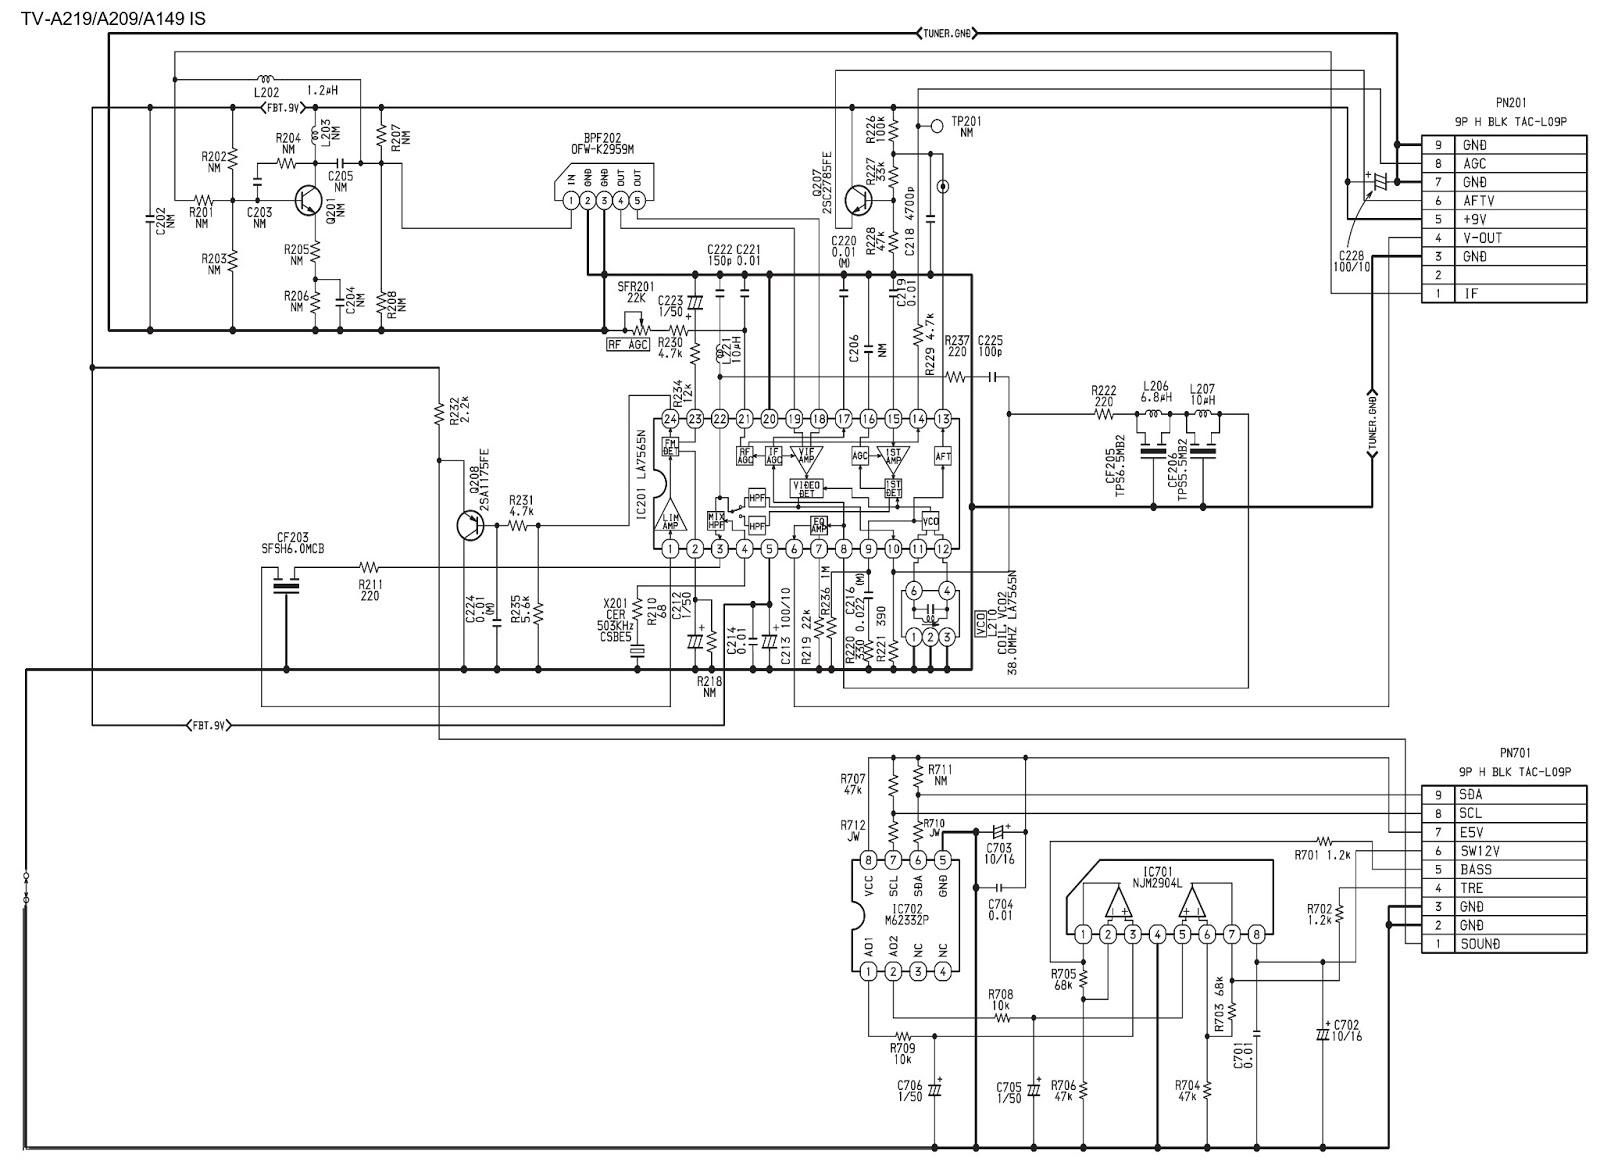 samsung crt tv schematic diagram get image about wiring samsung crt tv schematic diagram get image about wiring diagram schematic of a crt